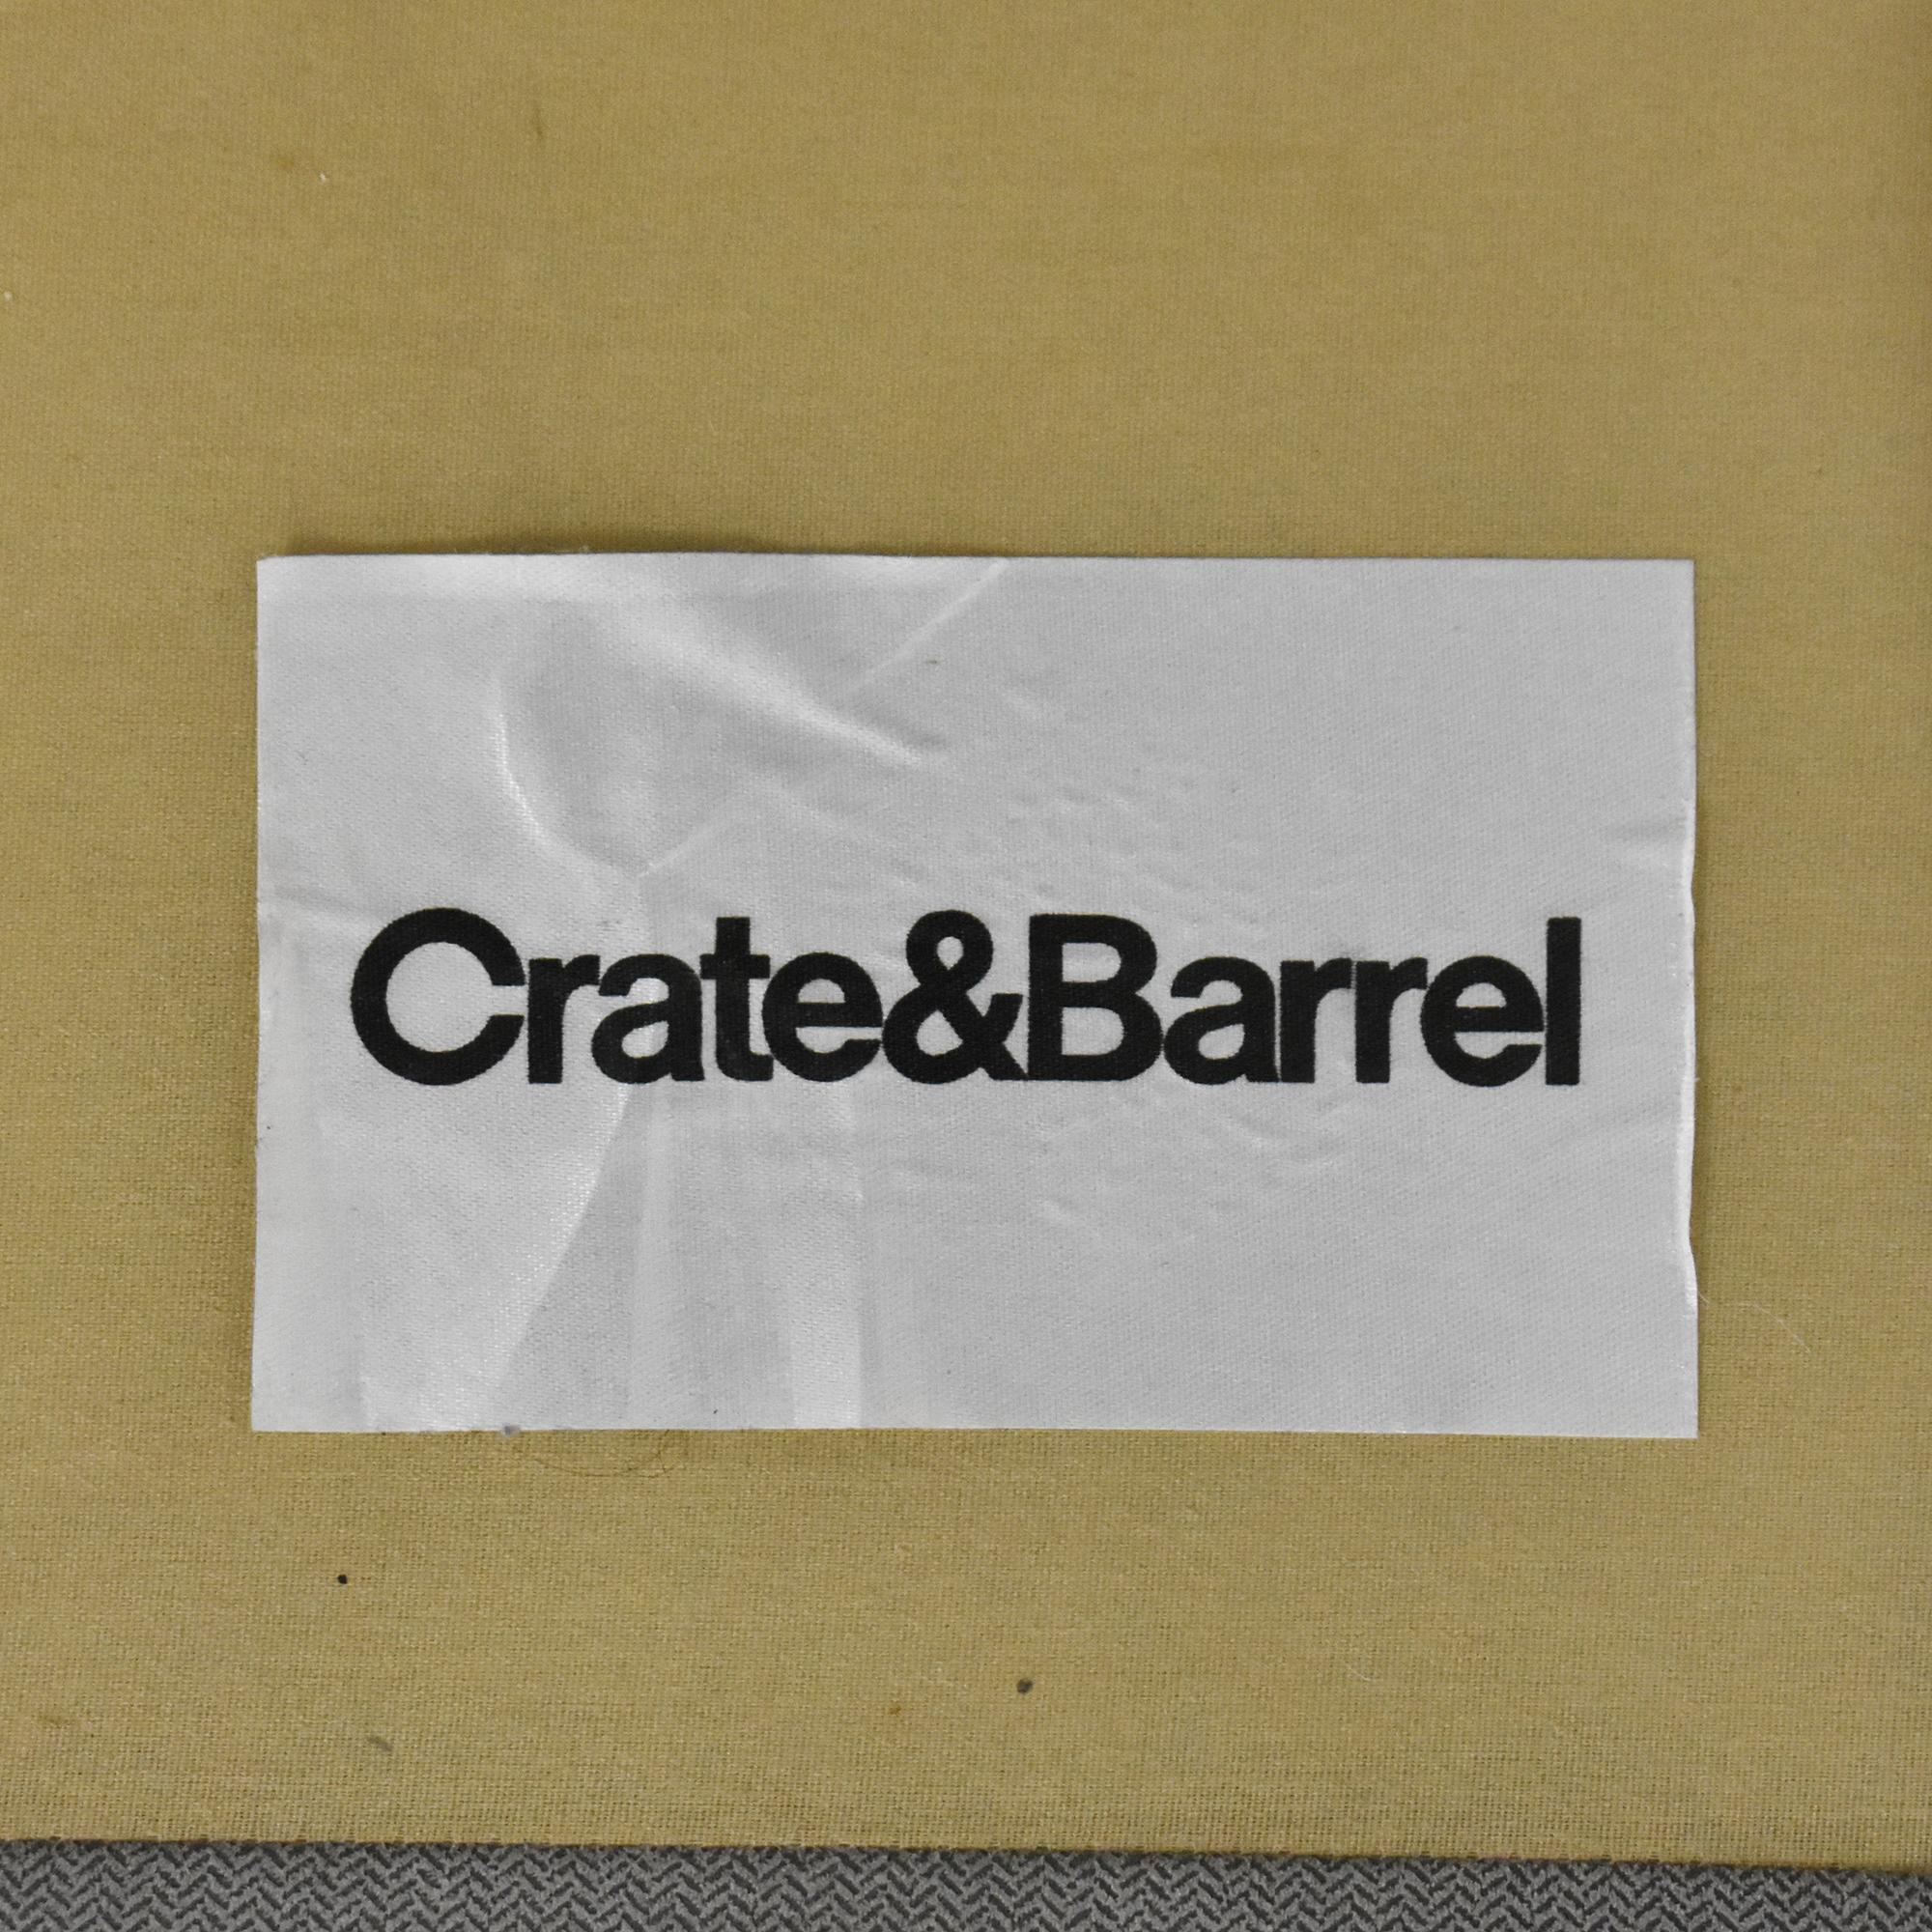 Crate & Barrel Crate & Barrel Axis II Two Piece Sectional Sofa nj